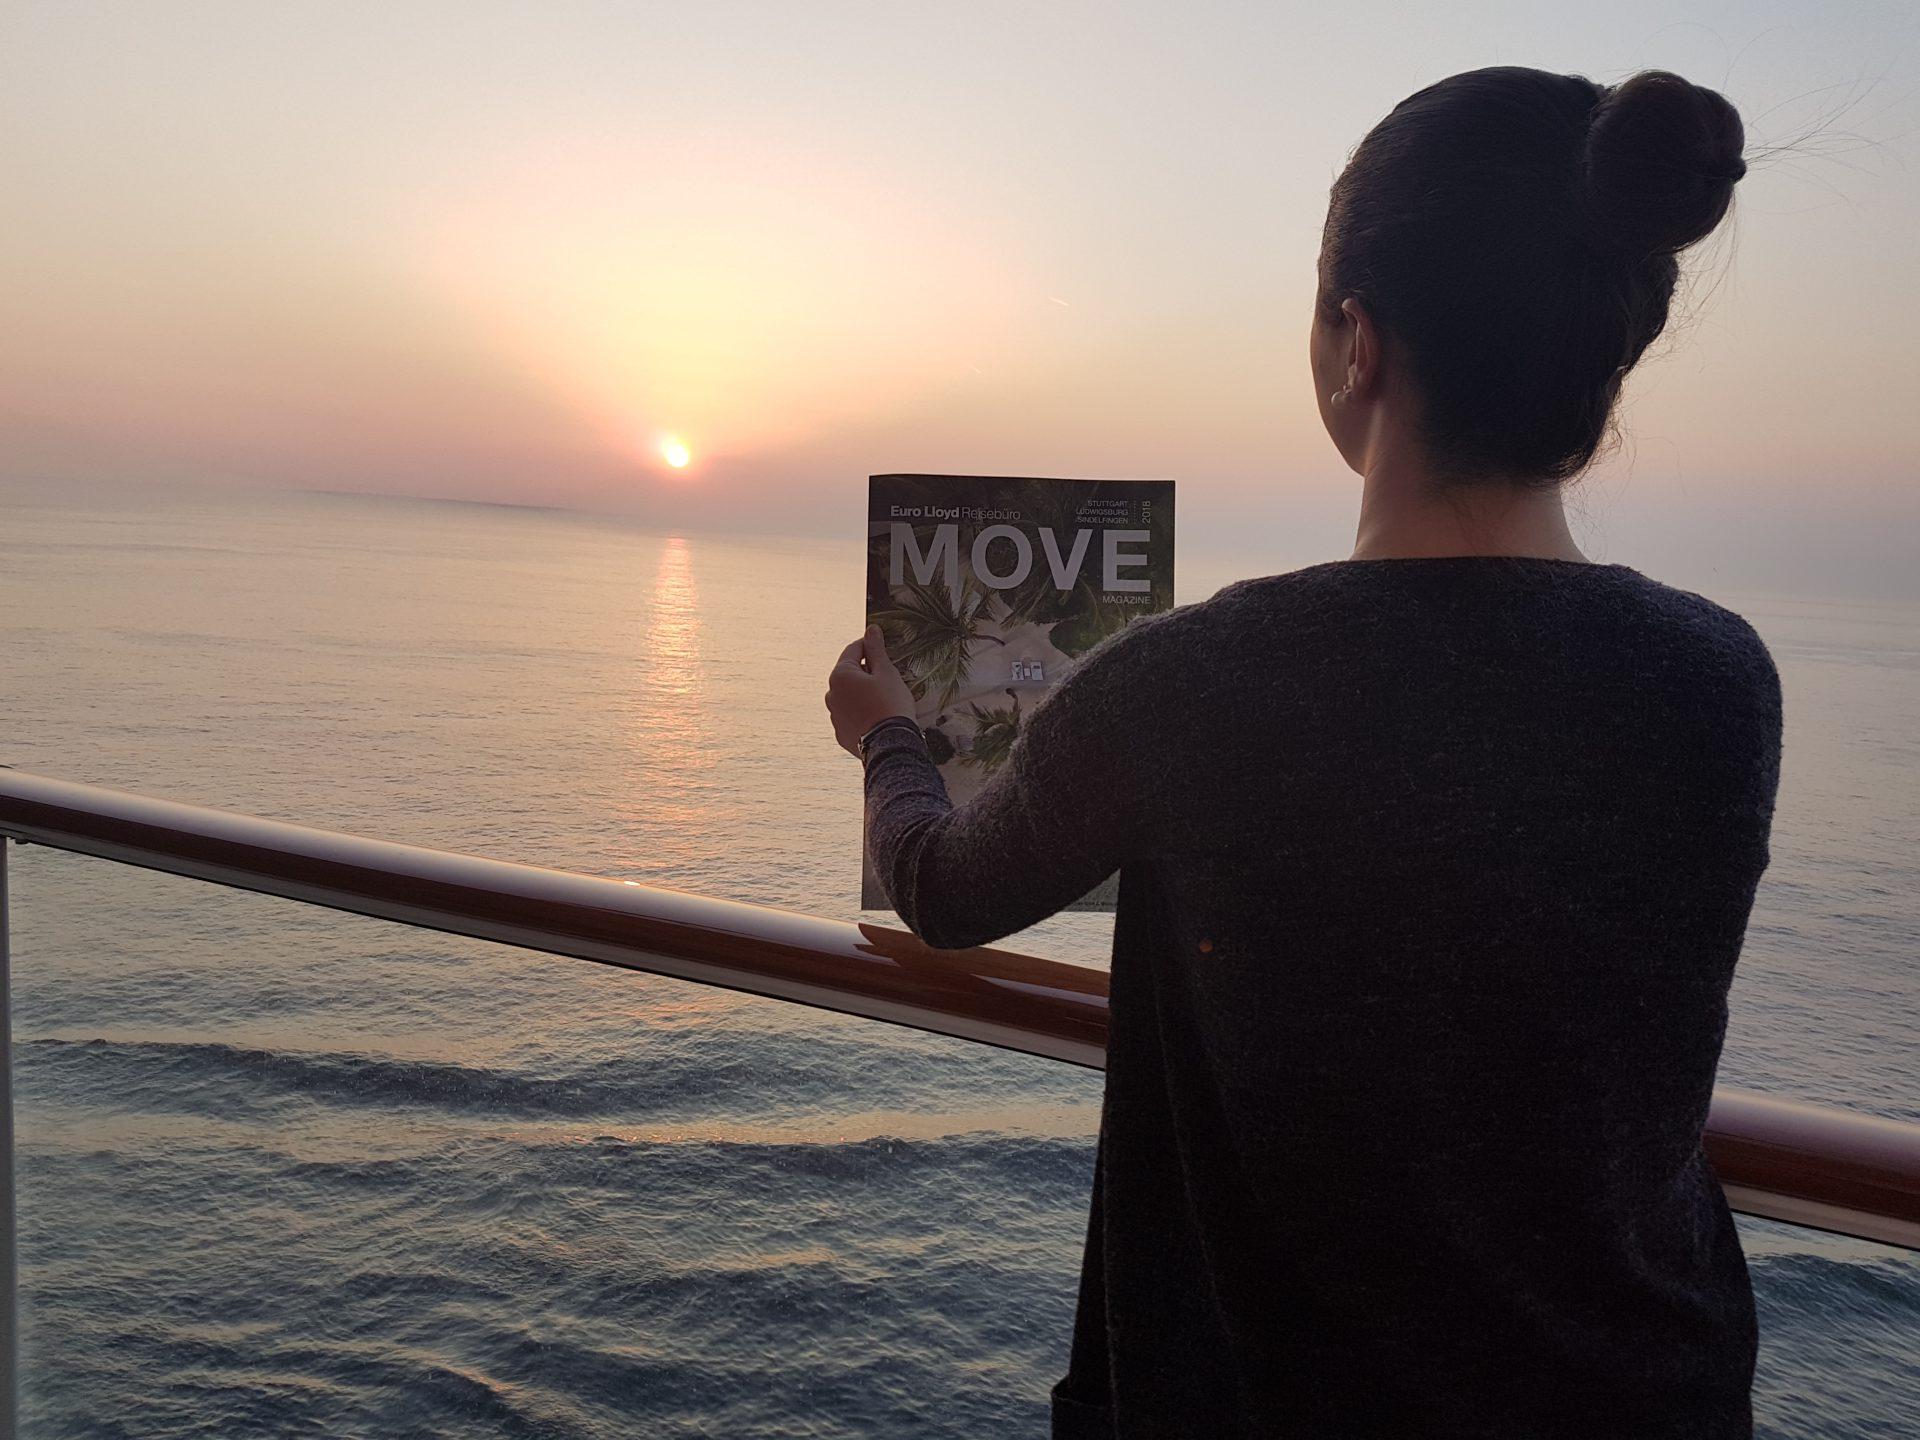 Ann-Christin Harst mit MOVE vor dem Sonnenuntergang an Bord der Norwegian Bliss